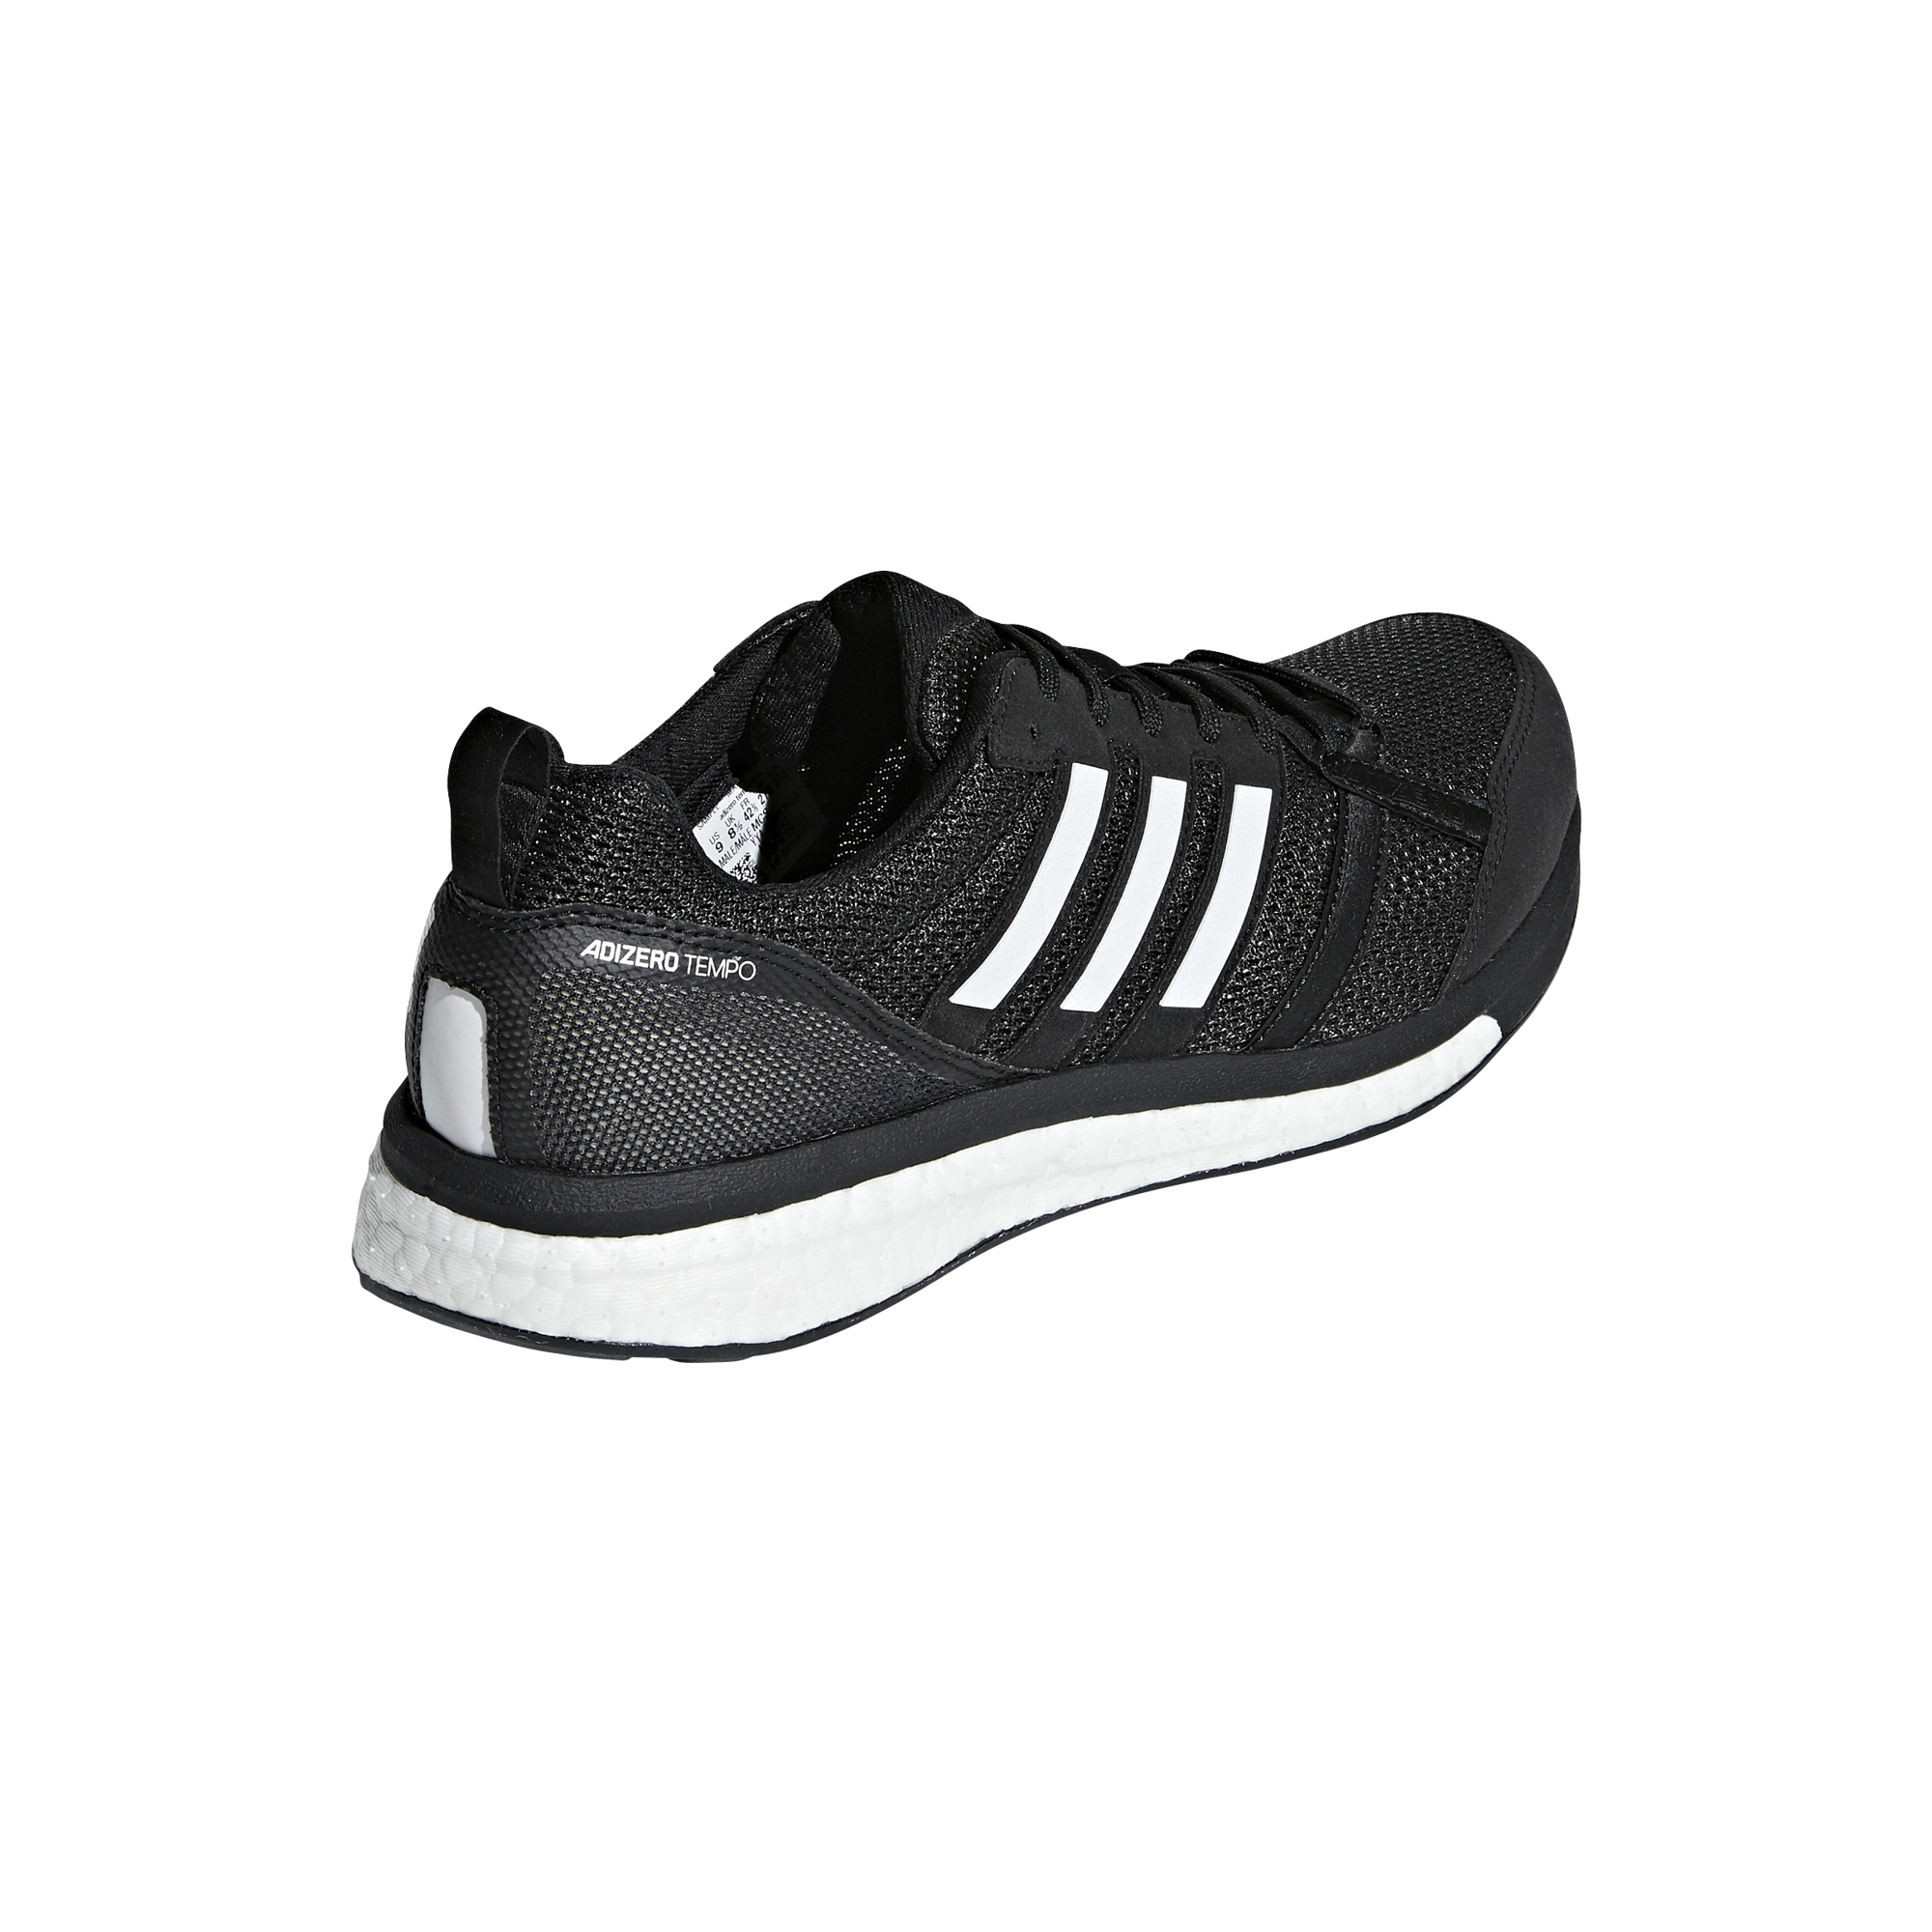 sports shoes 4bc99 74c4d Chaussures adidas s adizero Tempo 9